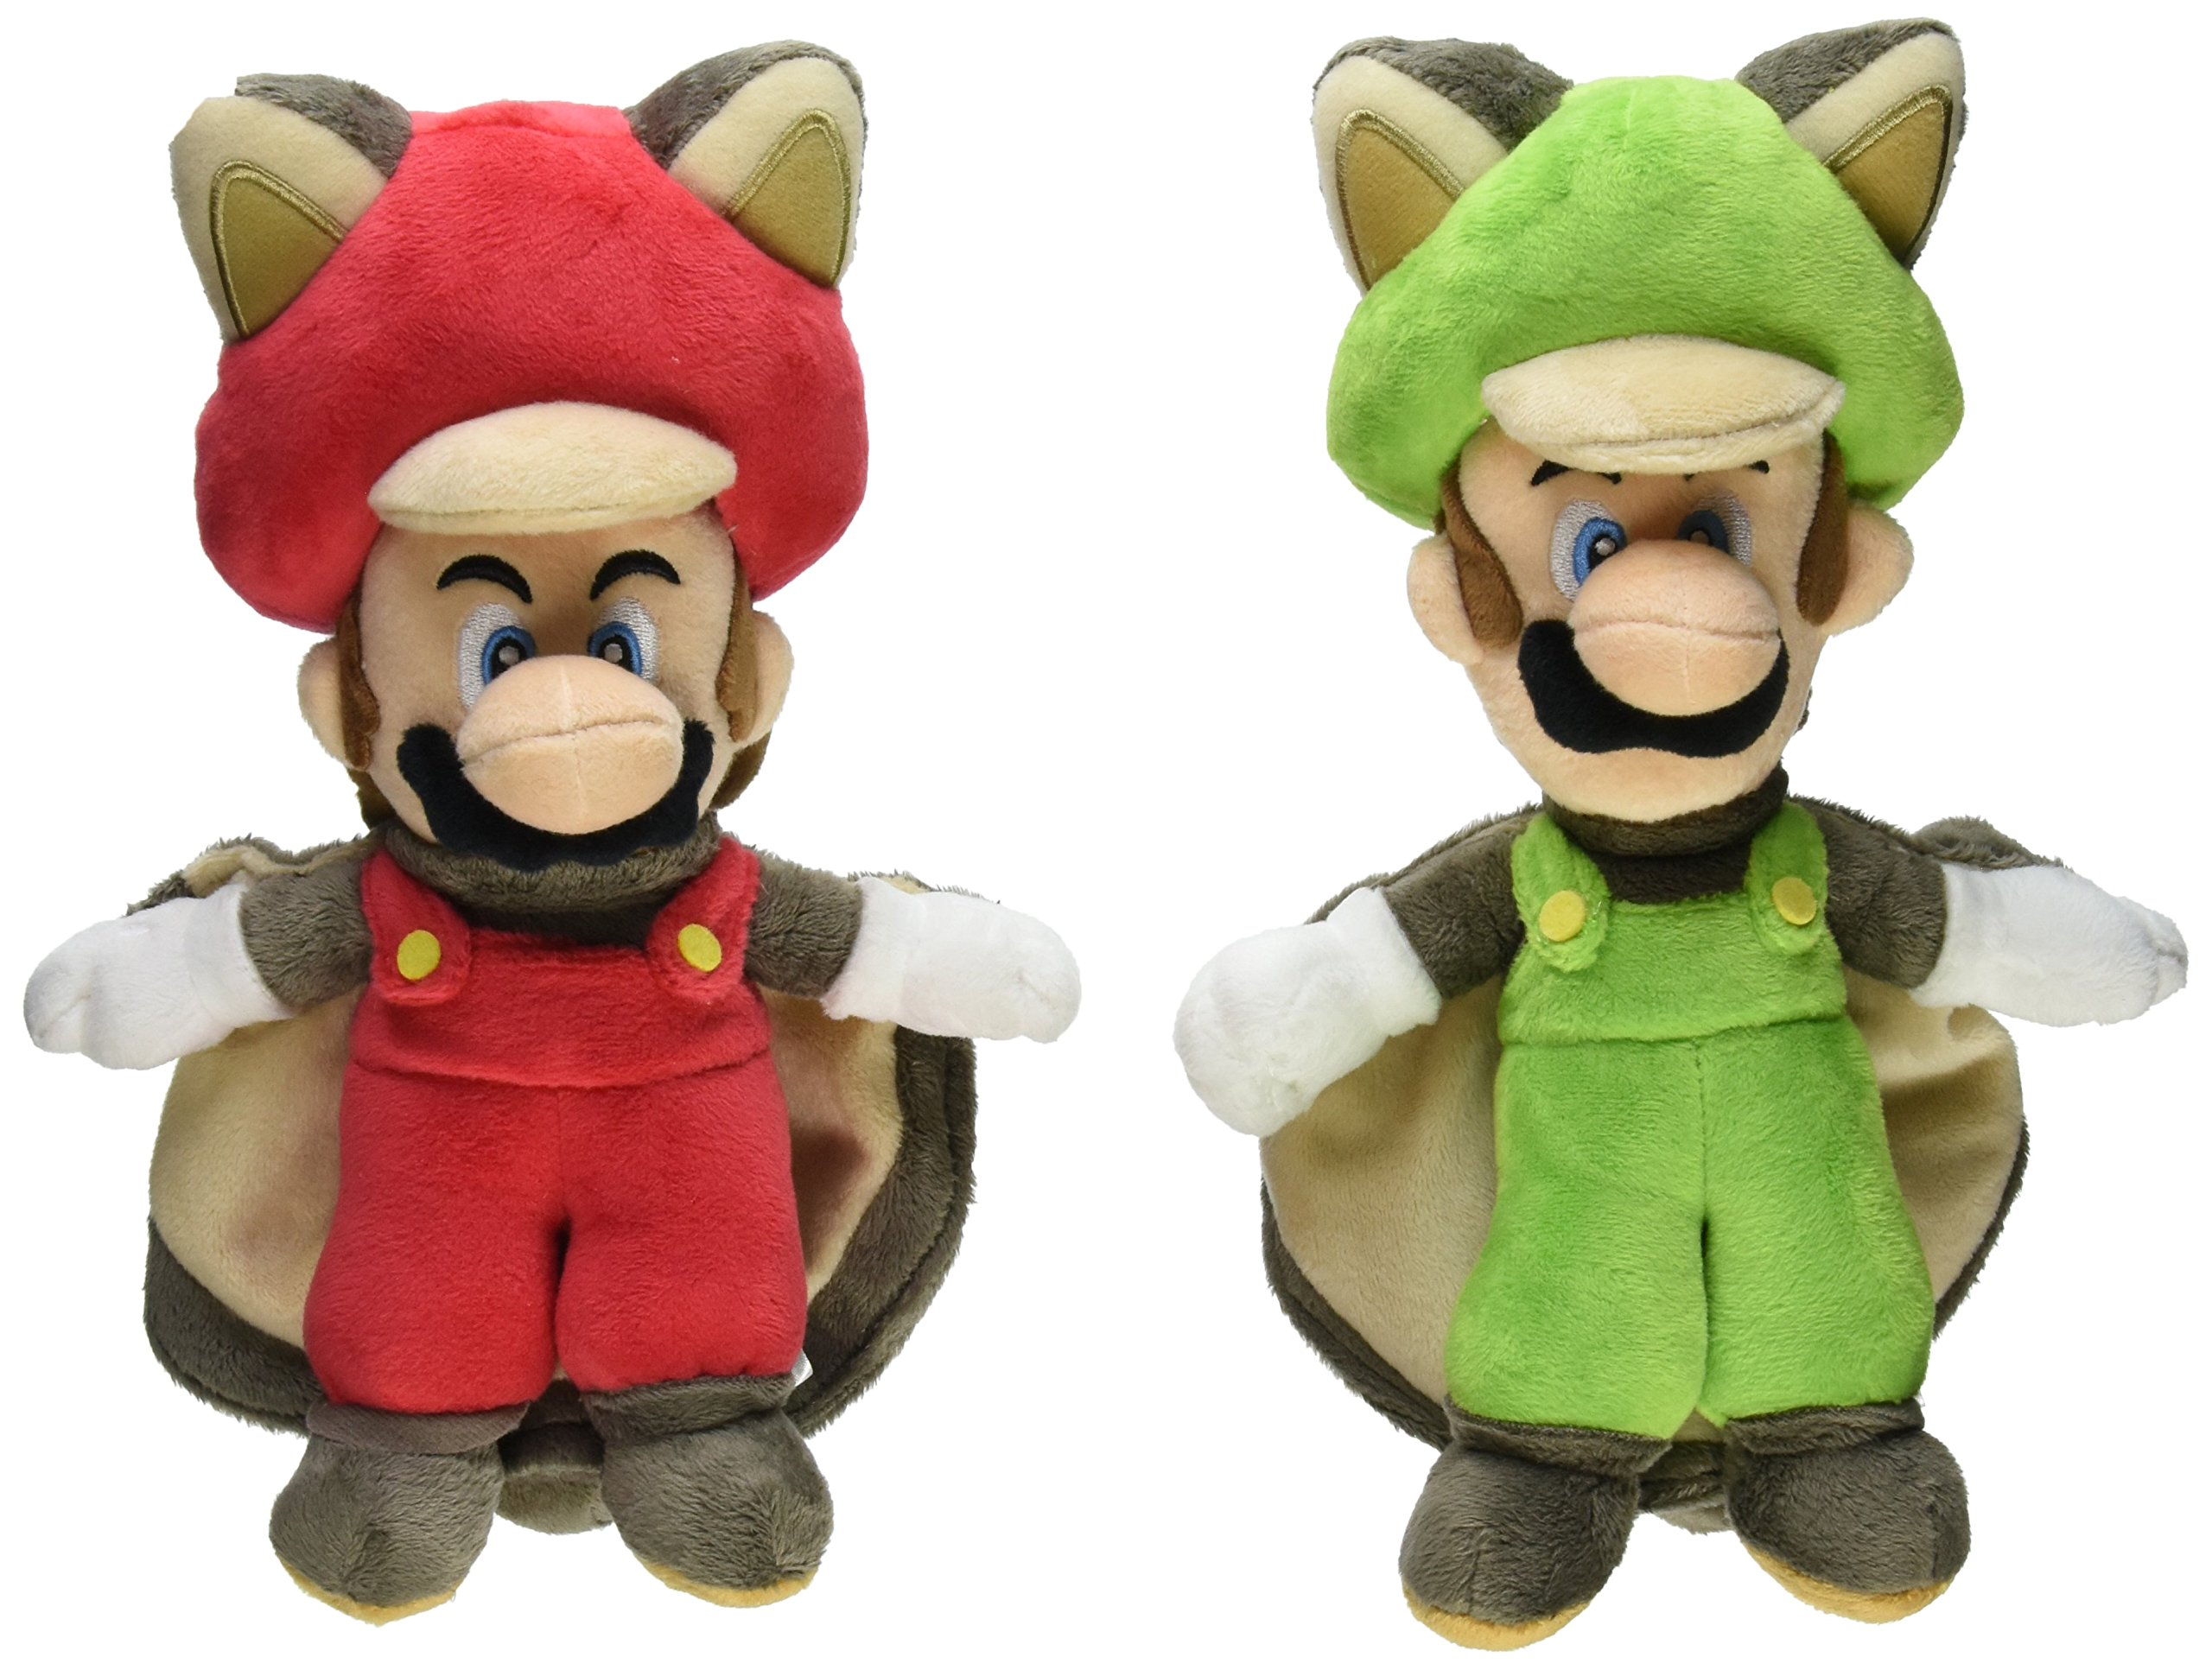 Little Buddy Mario Plush Doll Set of 2 - Flying Squirrel Mario & Squirrel Luigi by Little Buddy